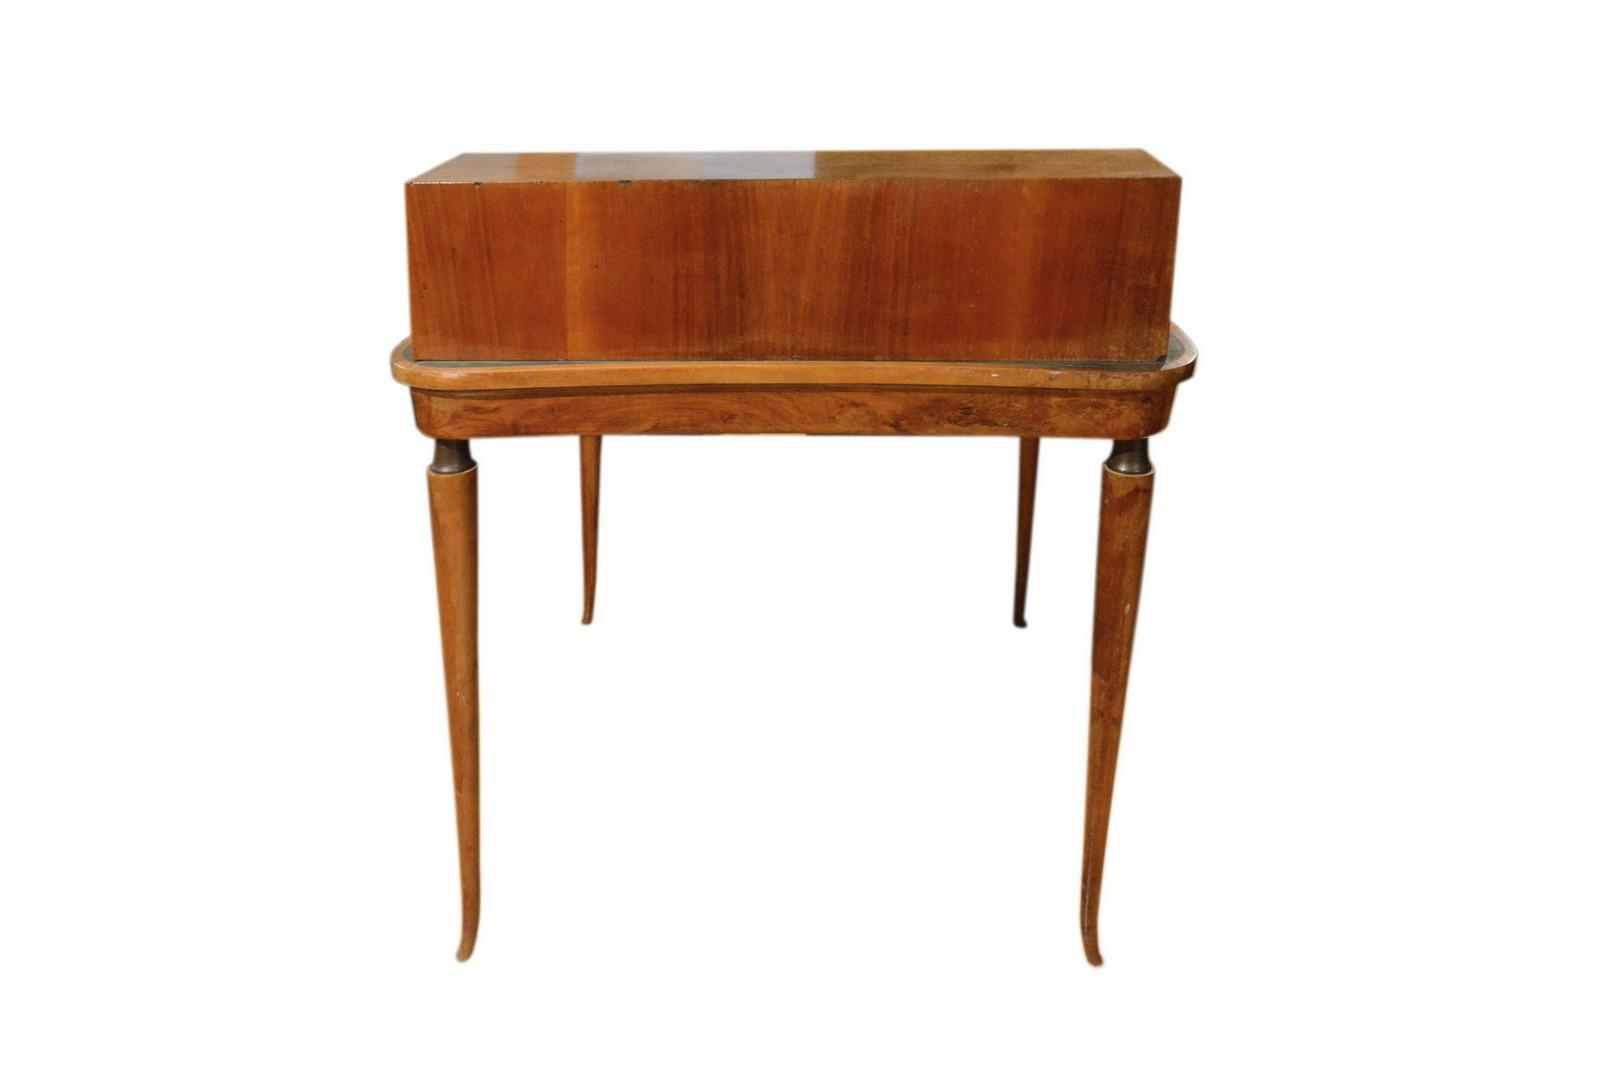 tavolo-inglese-anni-20-scrittorio-e-gioco-poker-5,2961.jpg?WebbinsCacheCounter=1